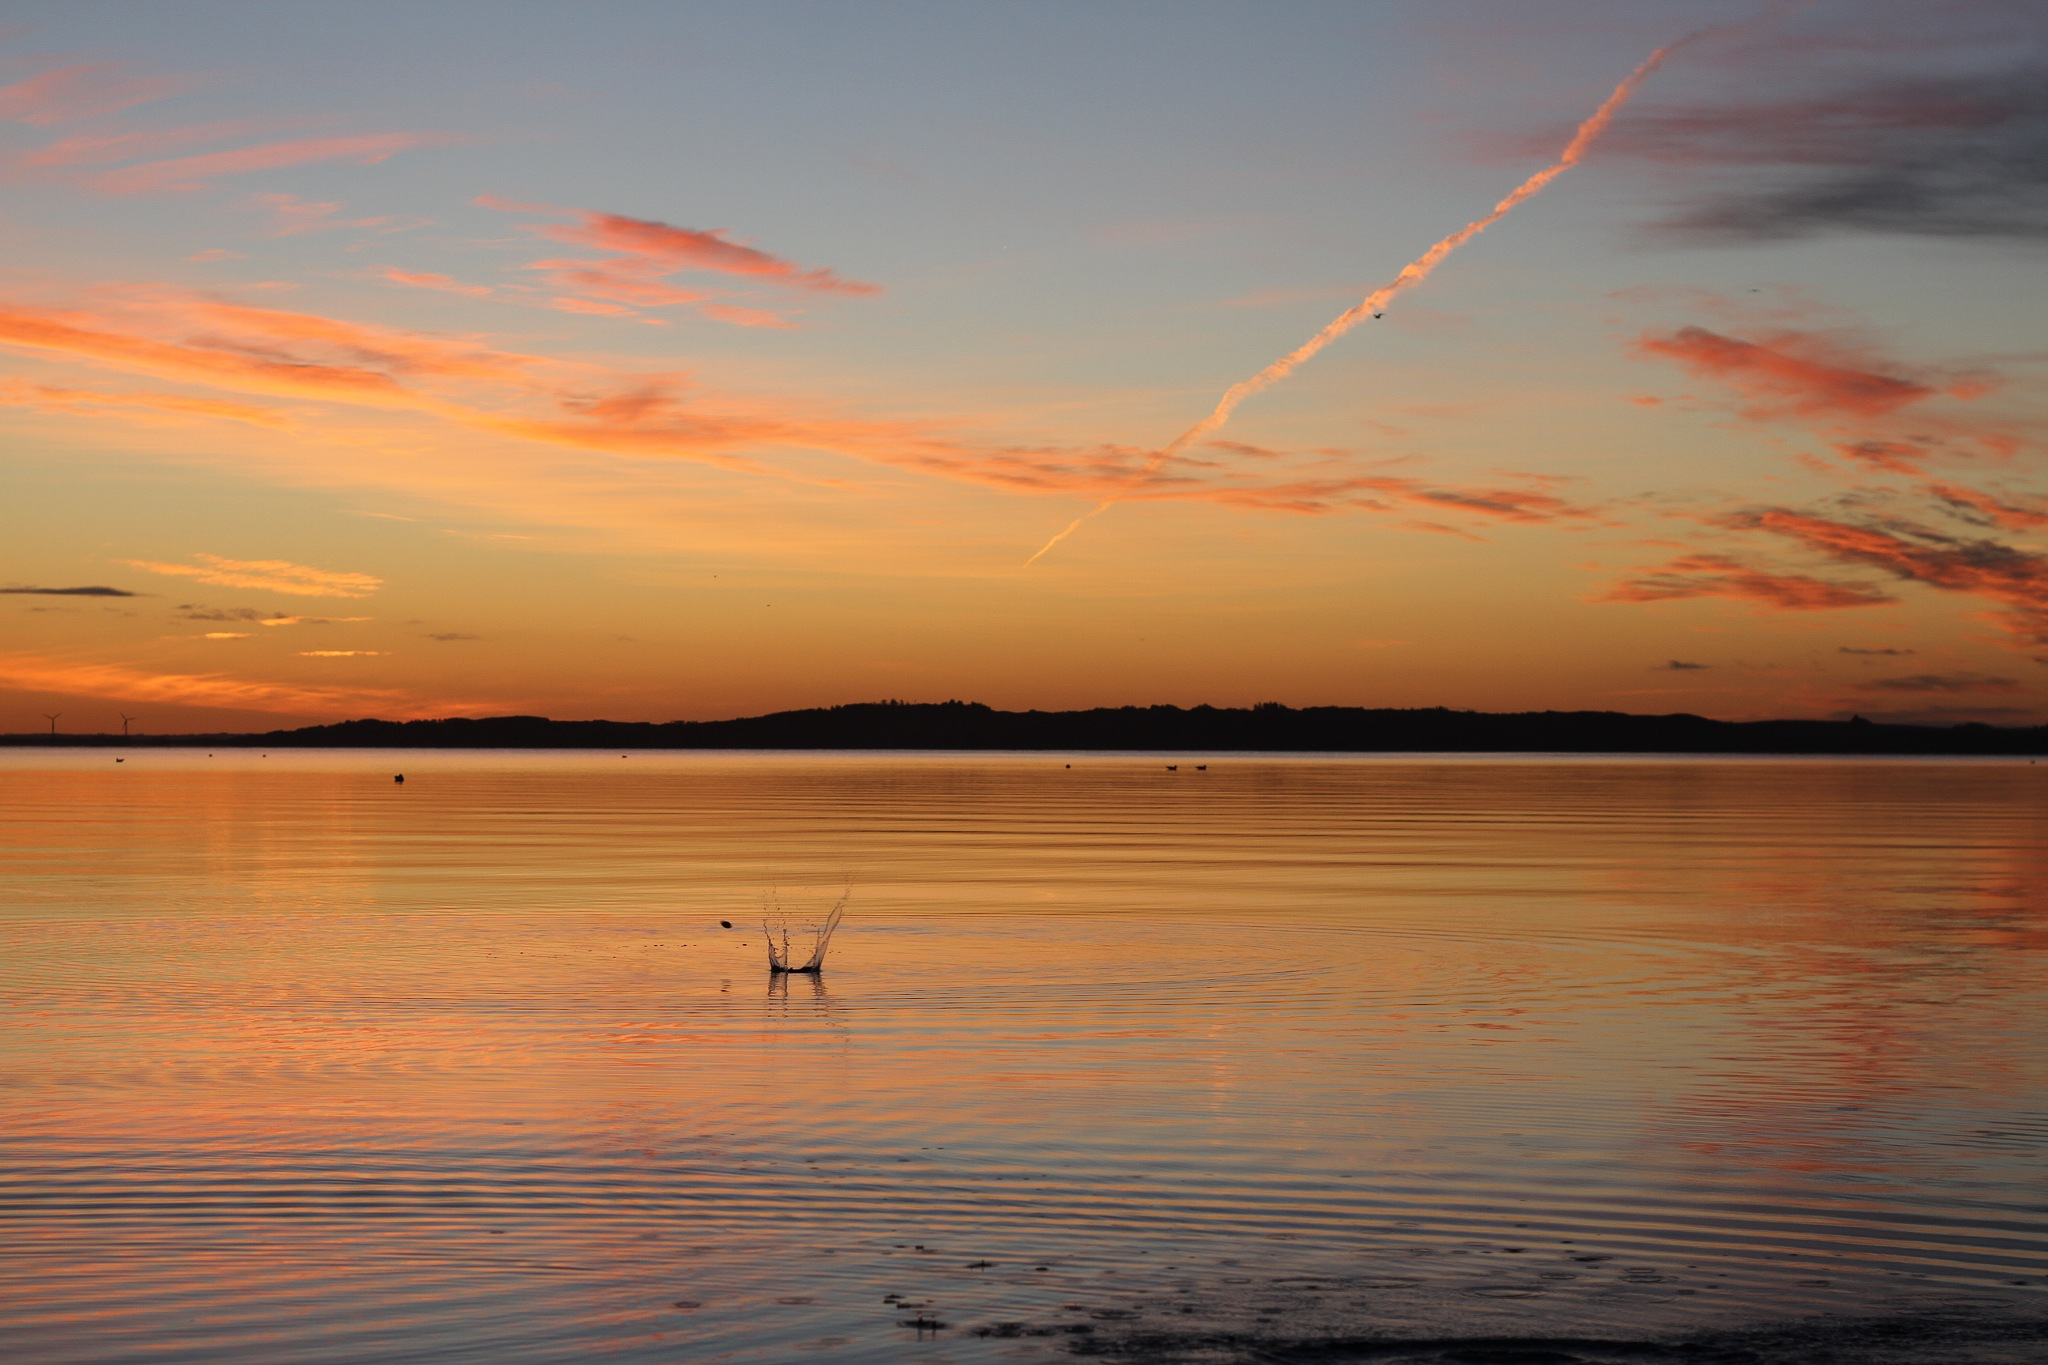 Sunrise by Mikkel Fredberg Lauritzen